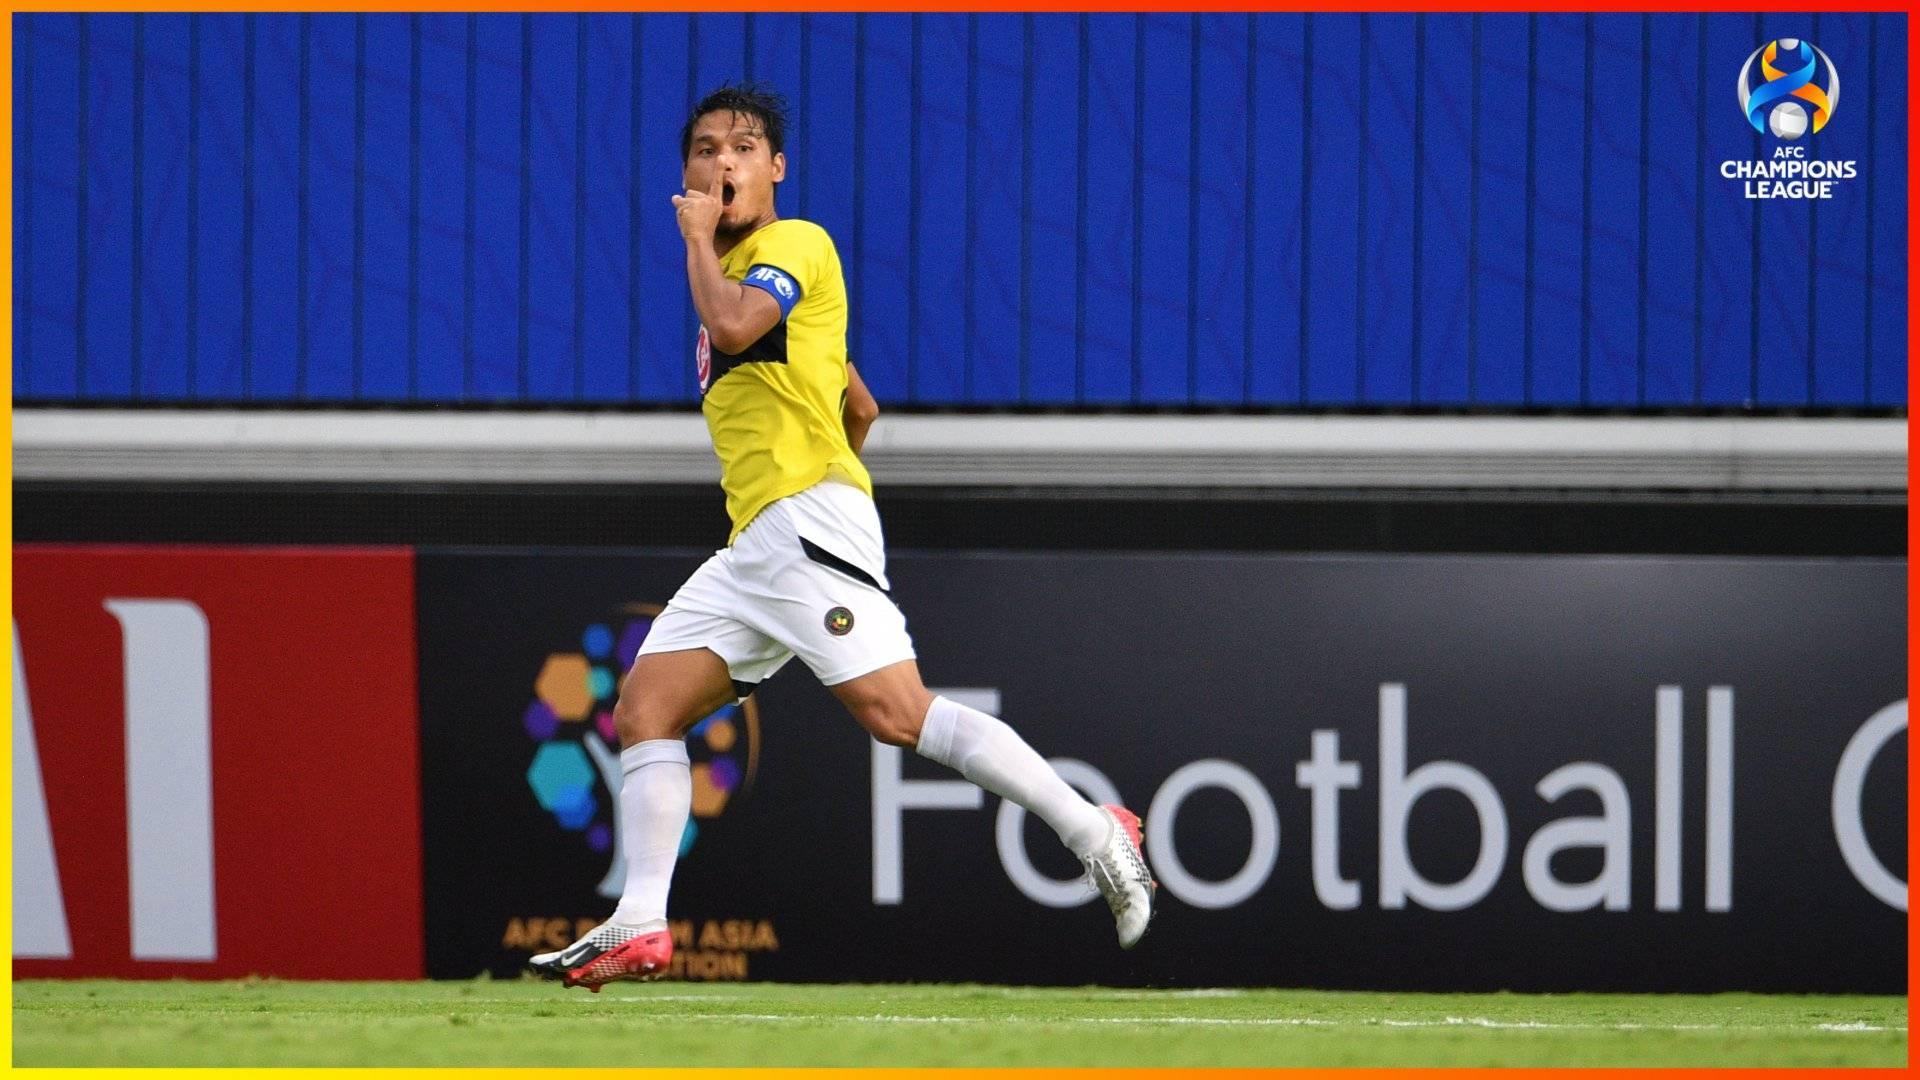 2021-AFC-Champions-League-Ulsan-Hyundai-def-Kaya-Bedic After valiant ACL stand, Jovin Bedic, Kaya-Iloilo yearn for more Football News PFL  - philippine sports news